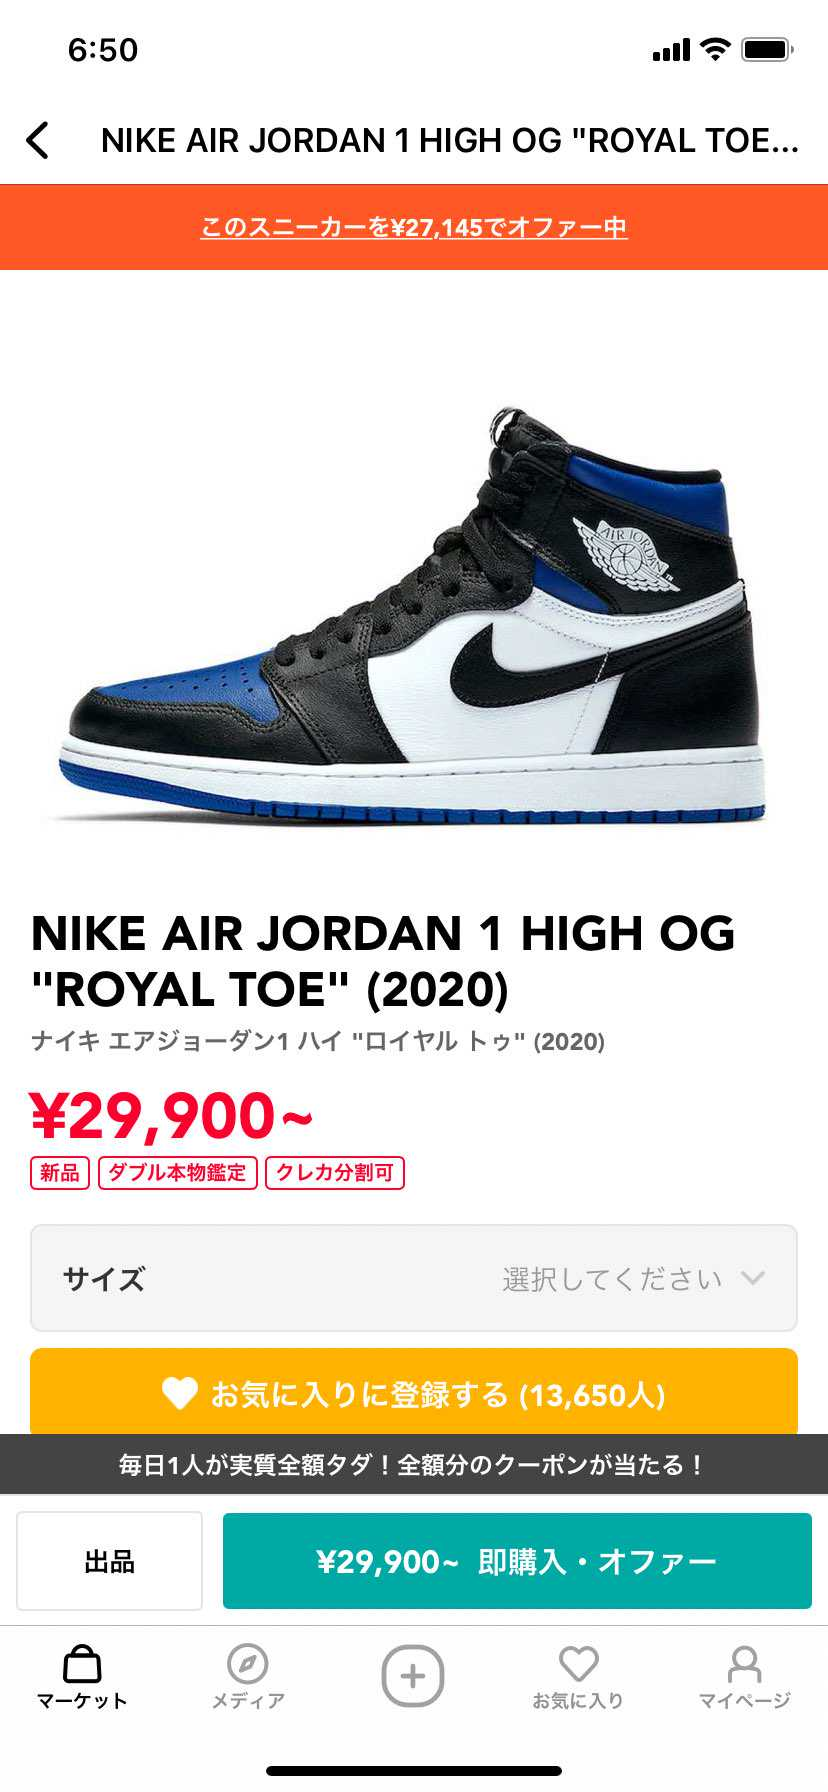 jordan1 toyal toe 26cmを27145円でオファーに出したので